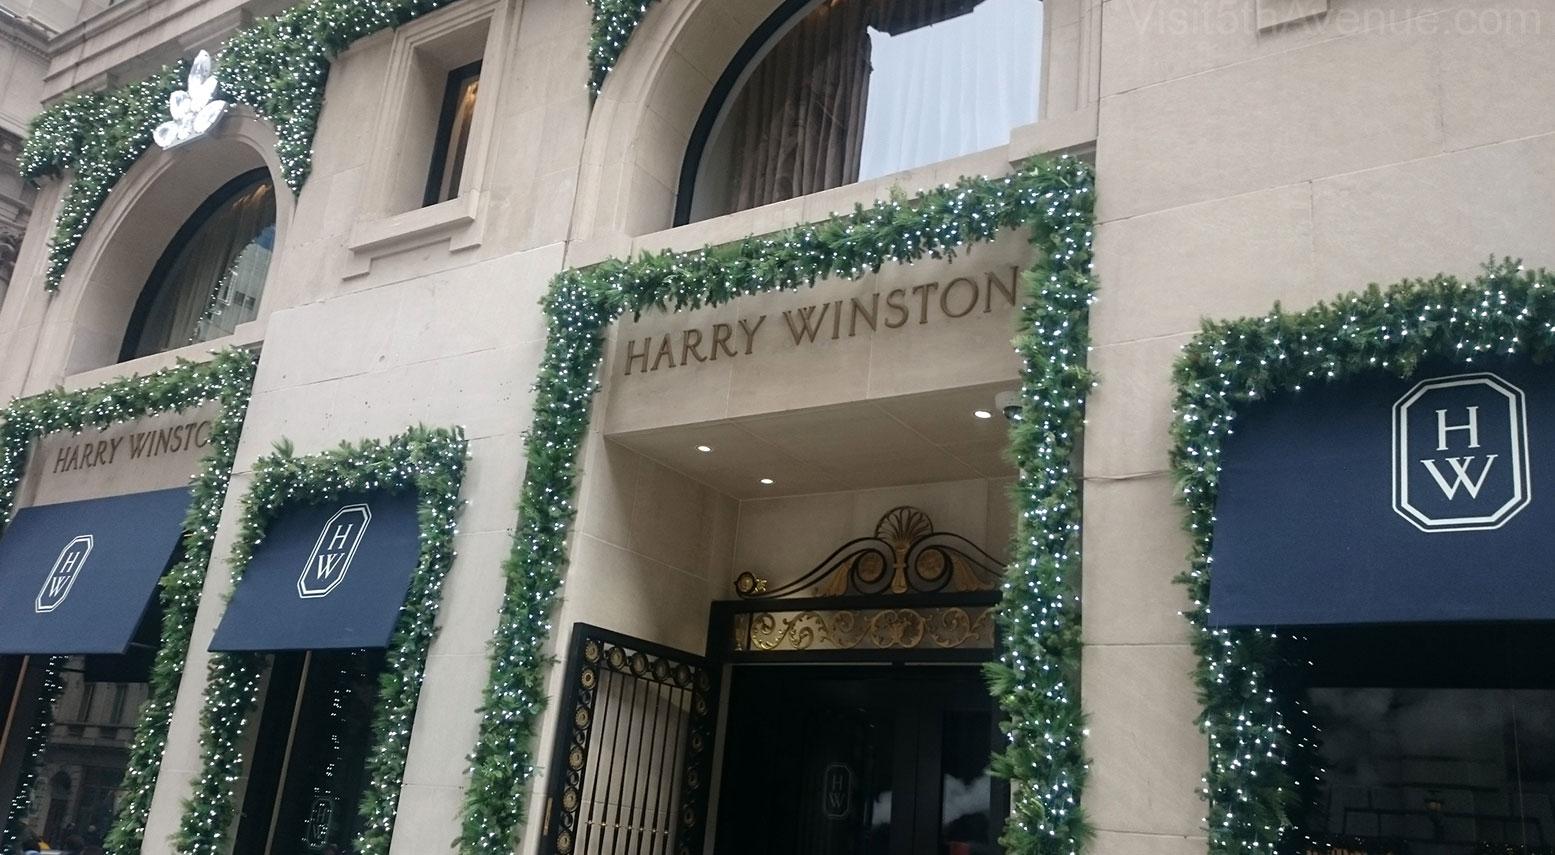 Harry Winston 701 5th Avenue